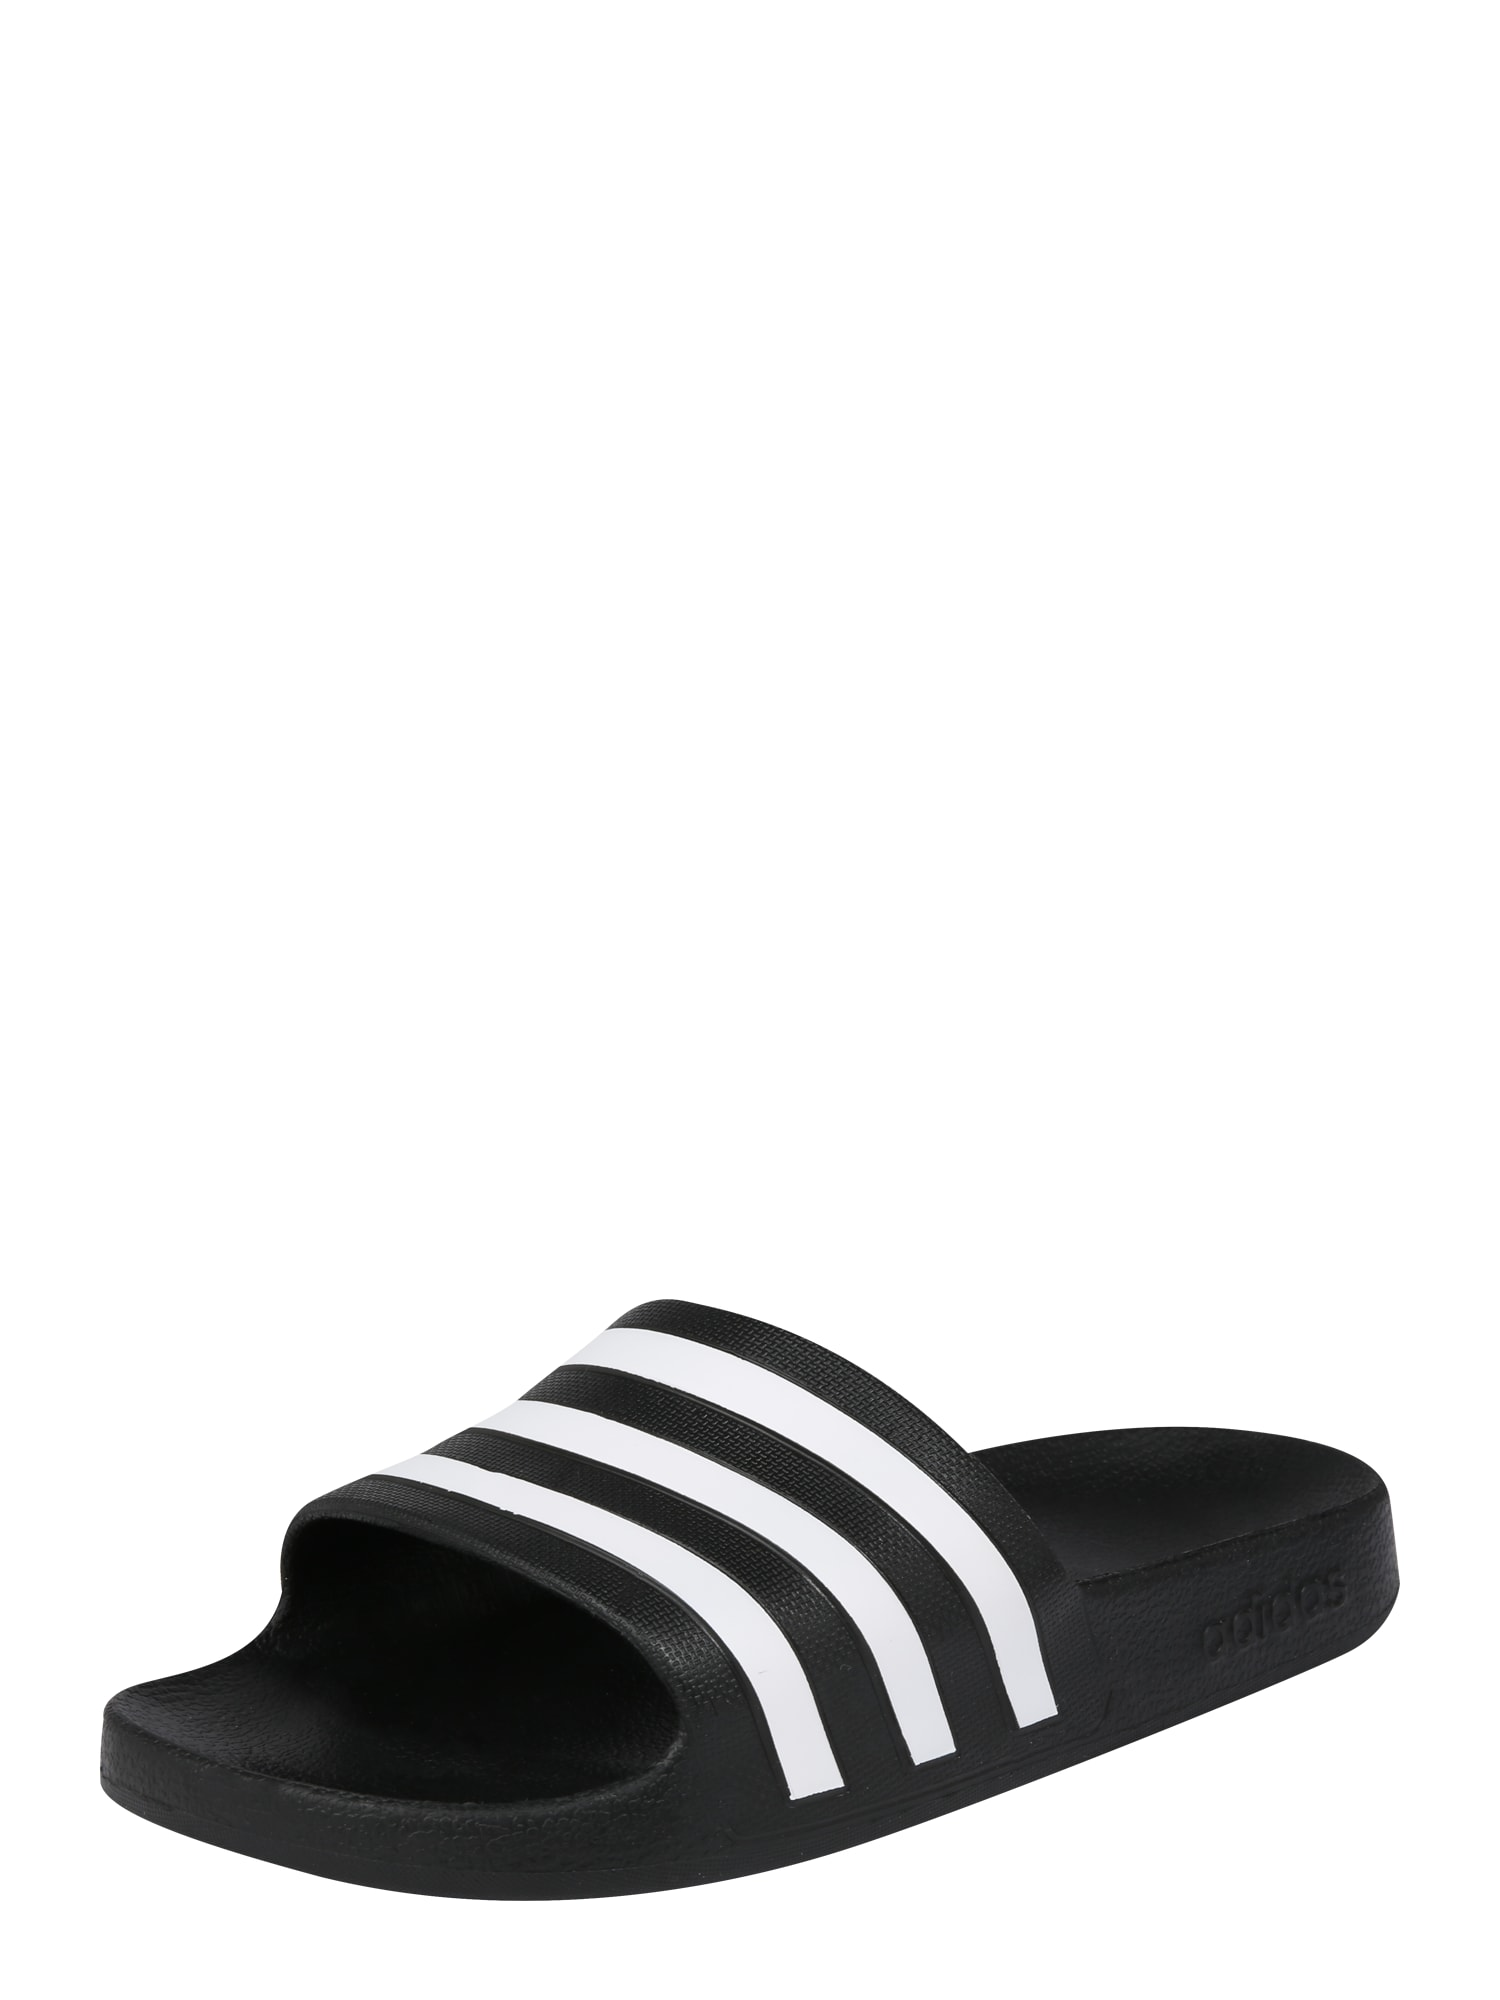 ADIDAS PERFORMANCE Flip-flops 'AQUA'  negru / alb